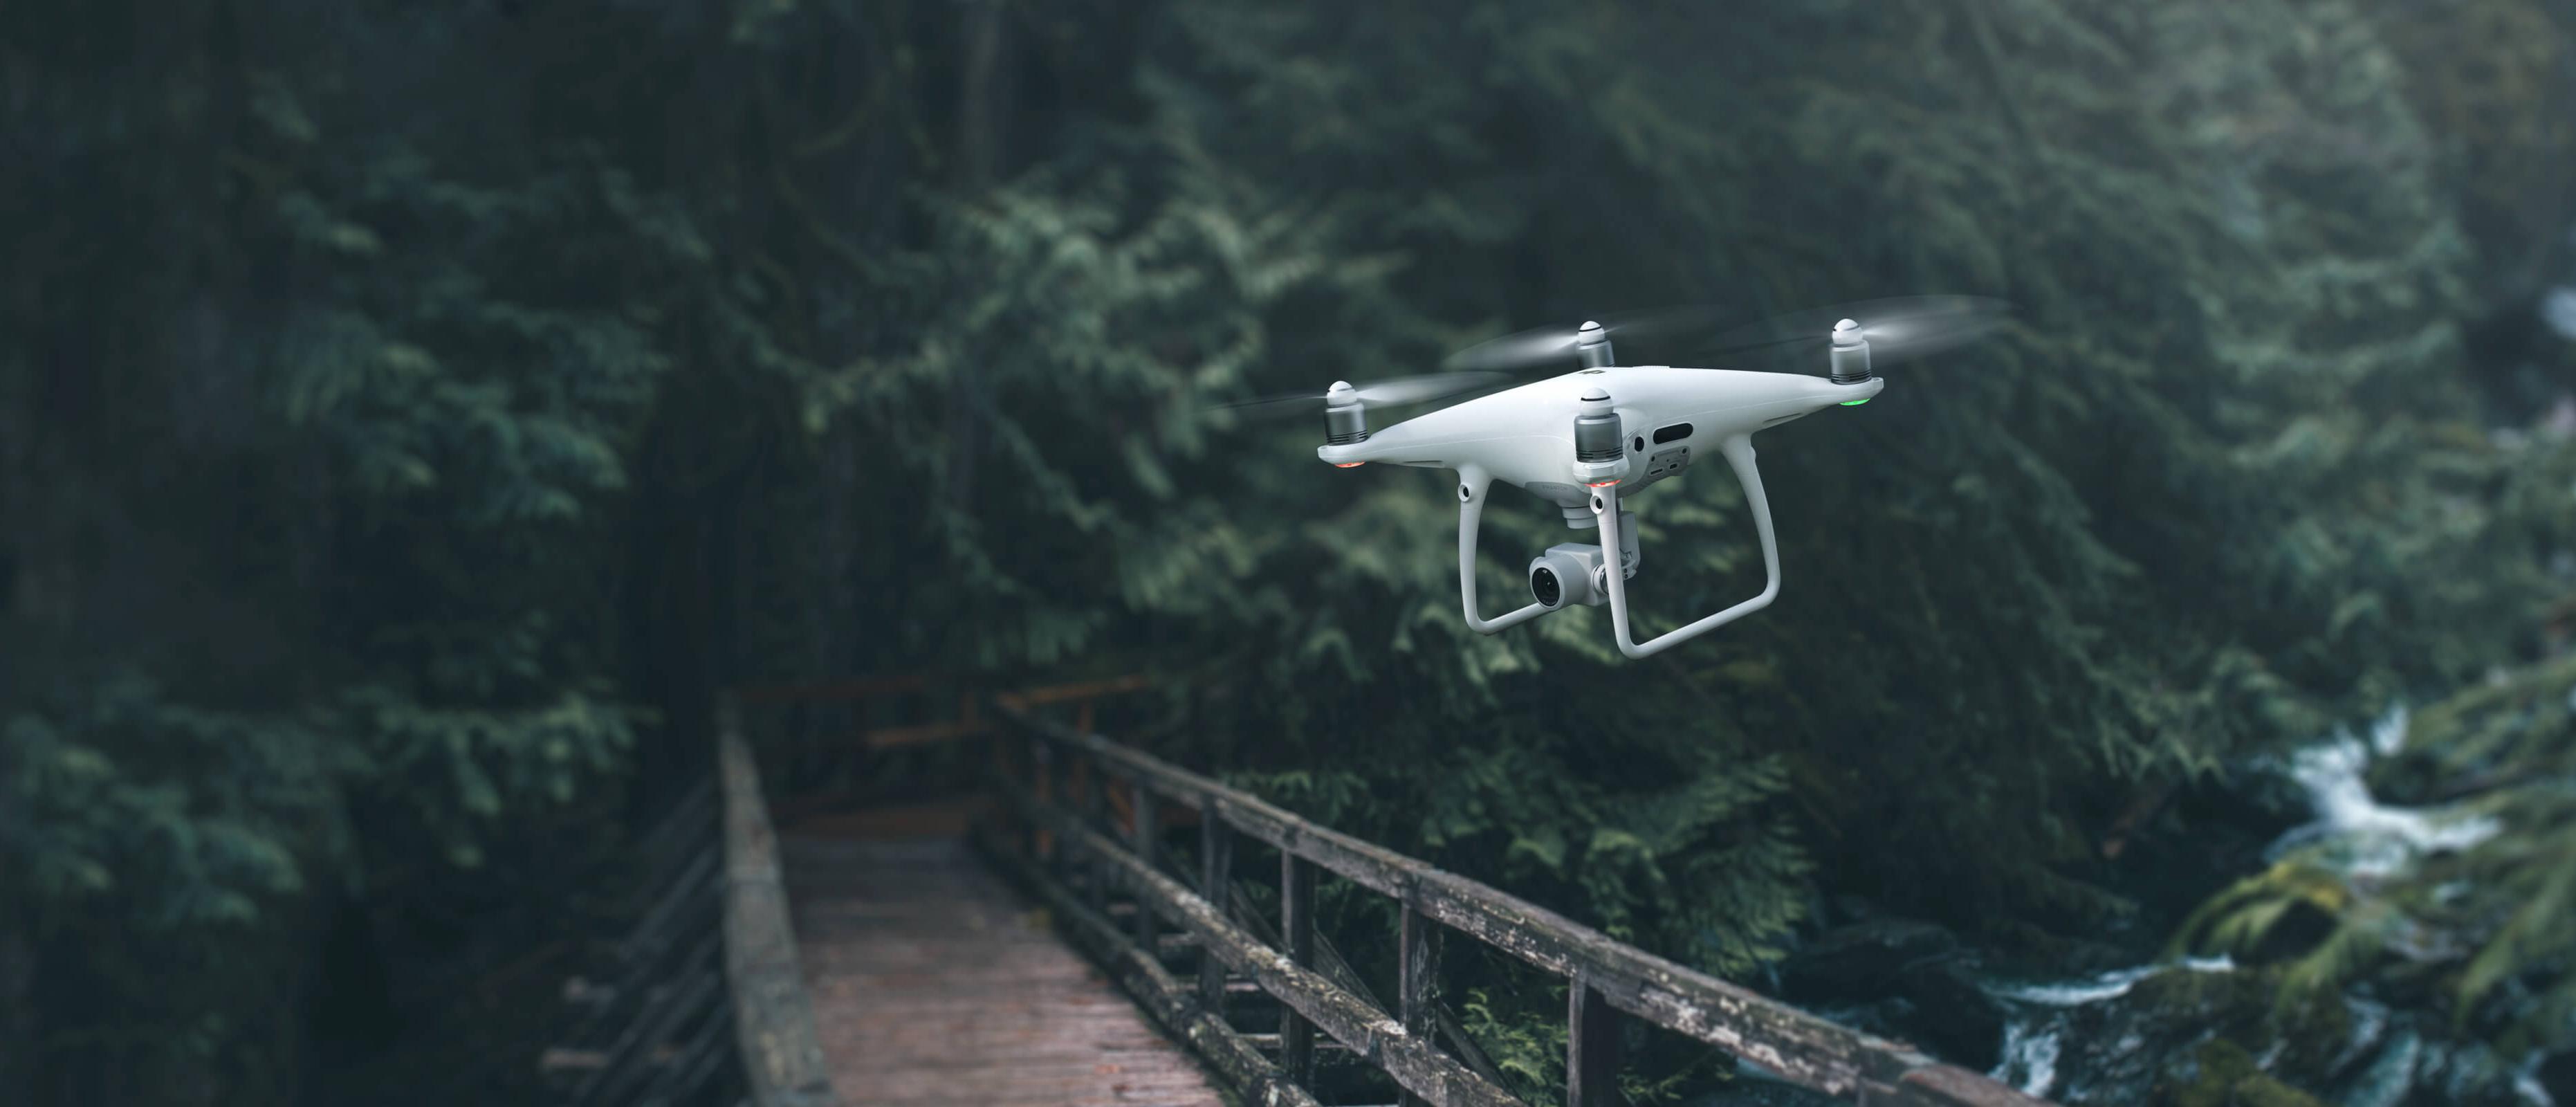 dji-phantom-4-pro-droon-photopoint-kaupokalda